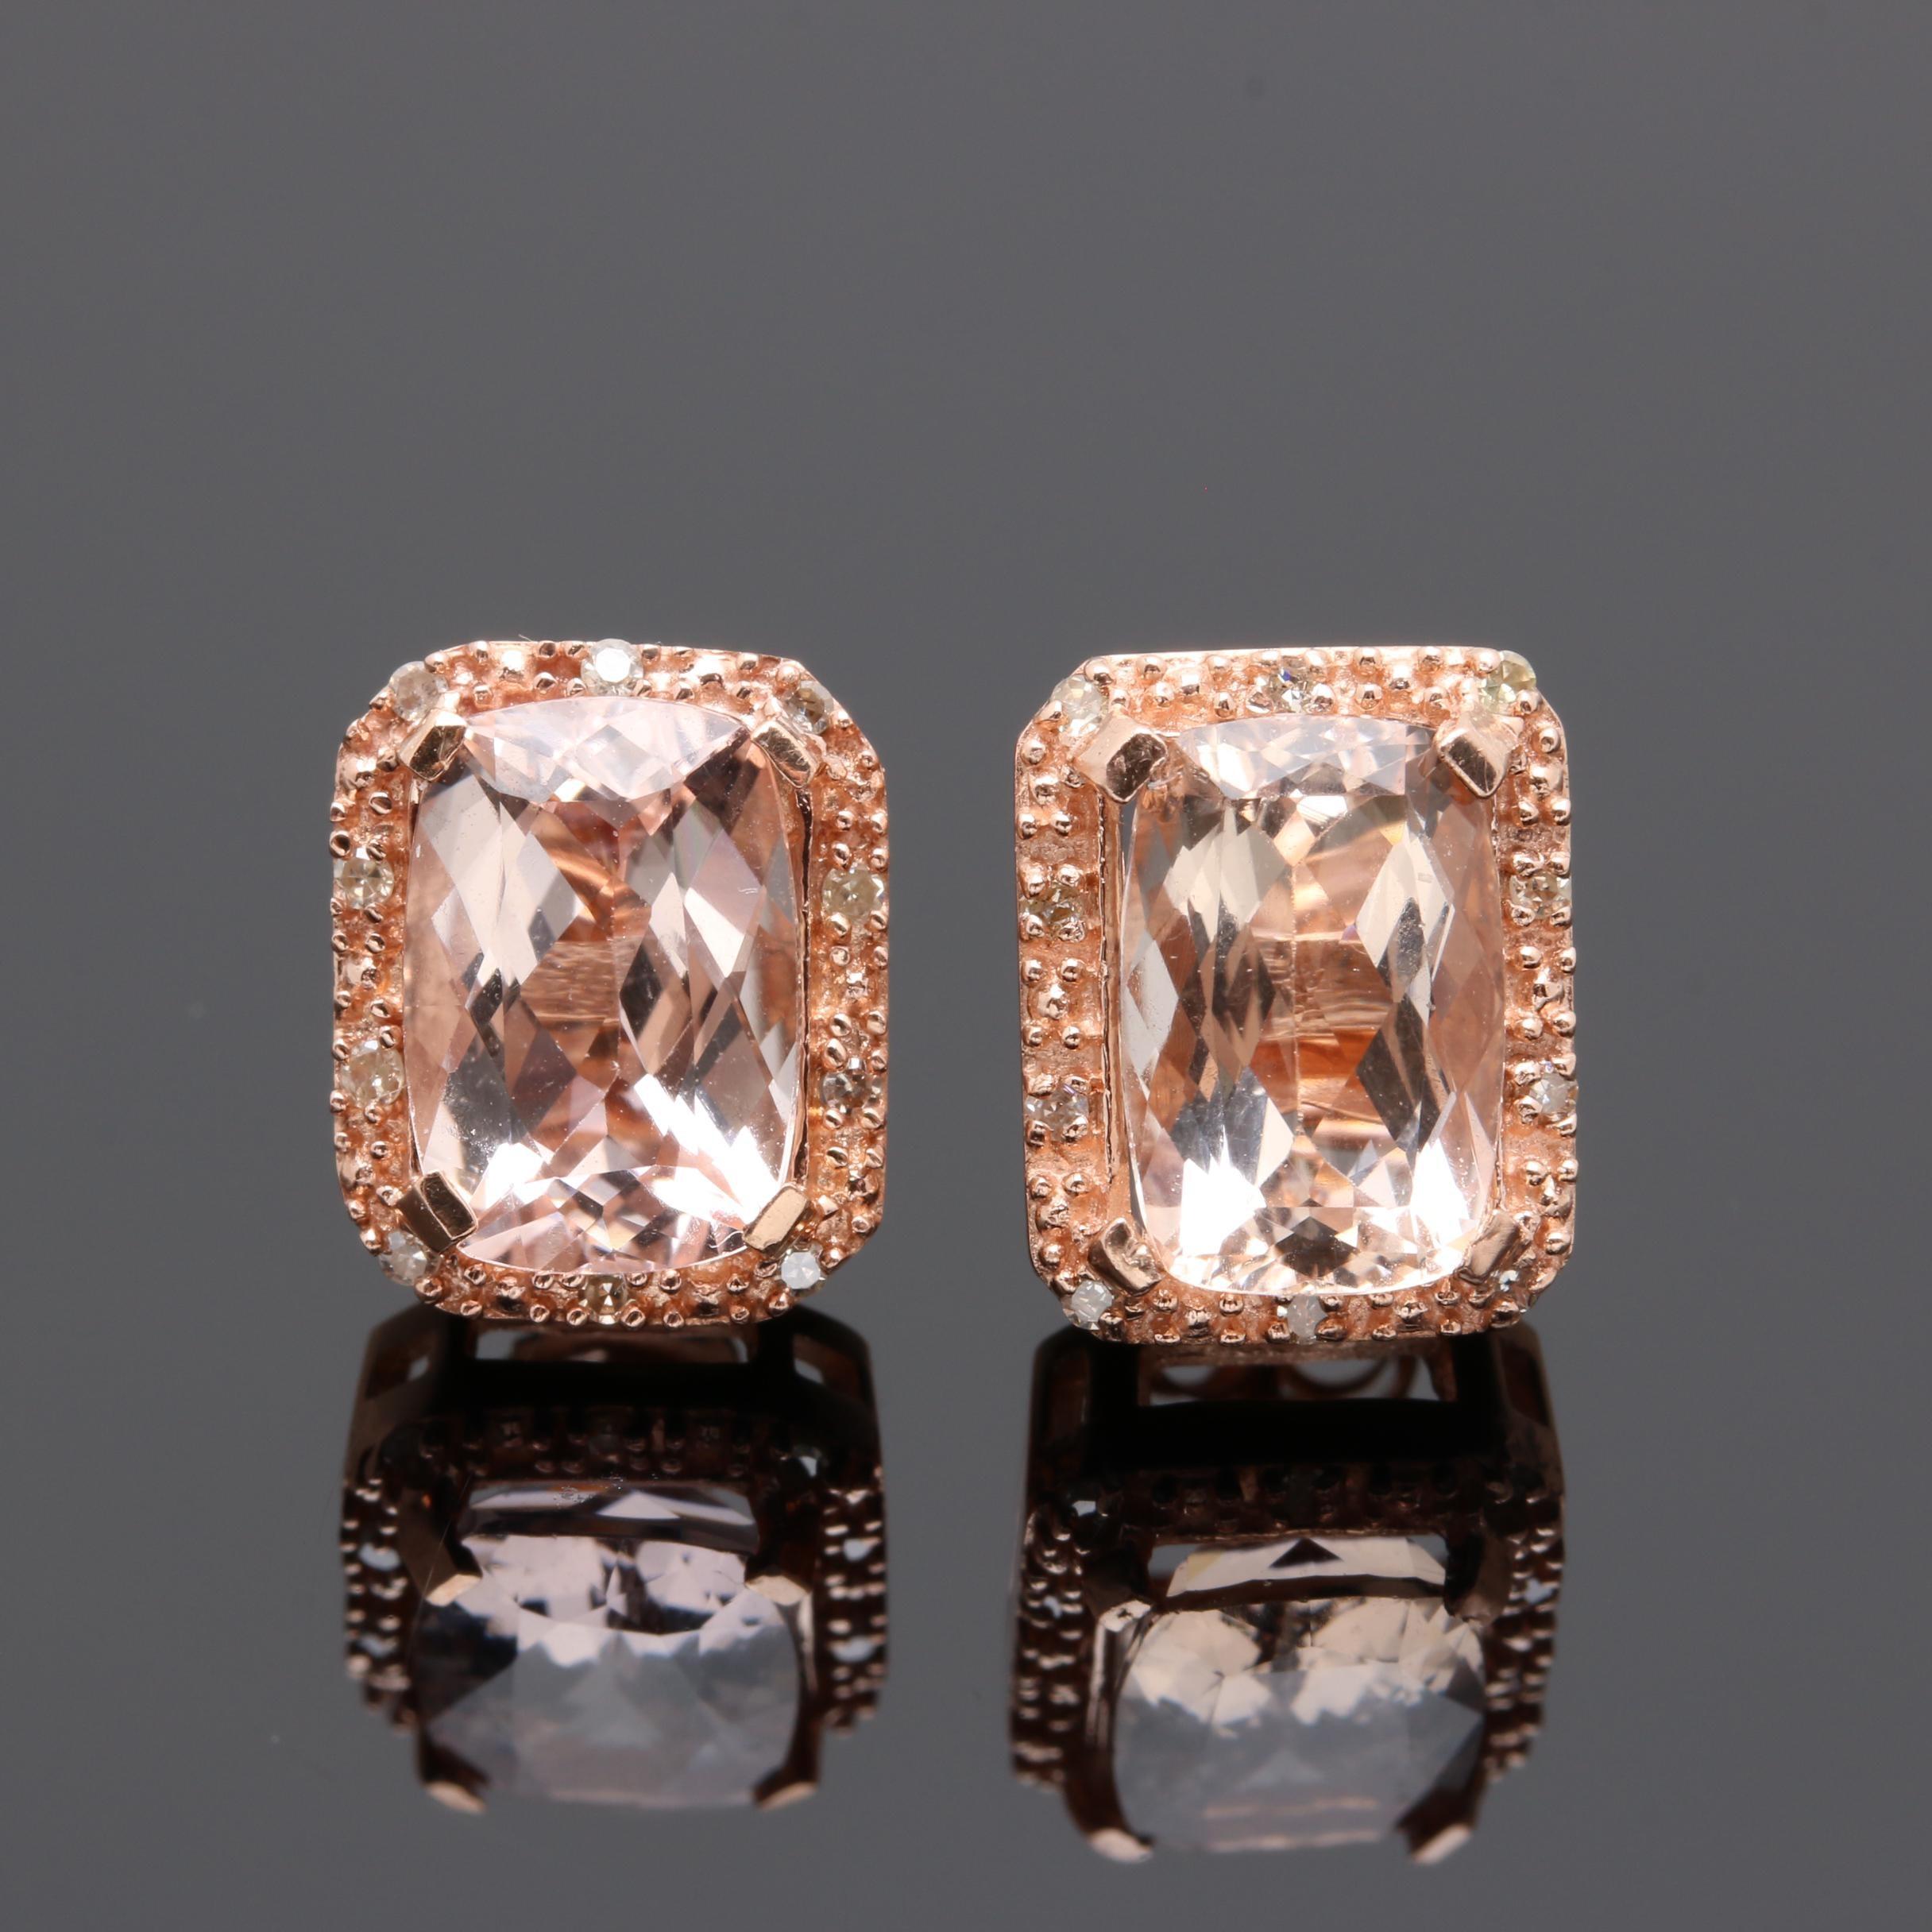 10K Rose Gold Morganite and Diamond Earrings